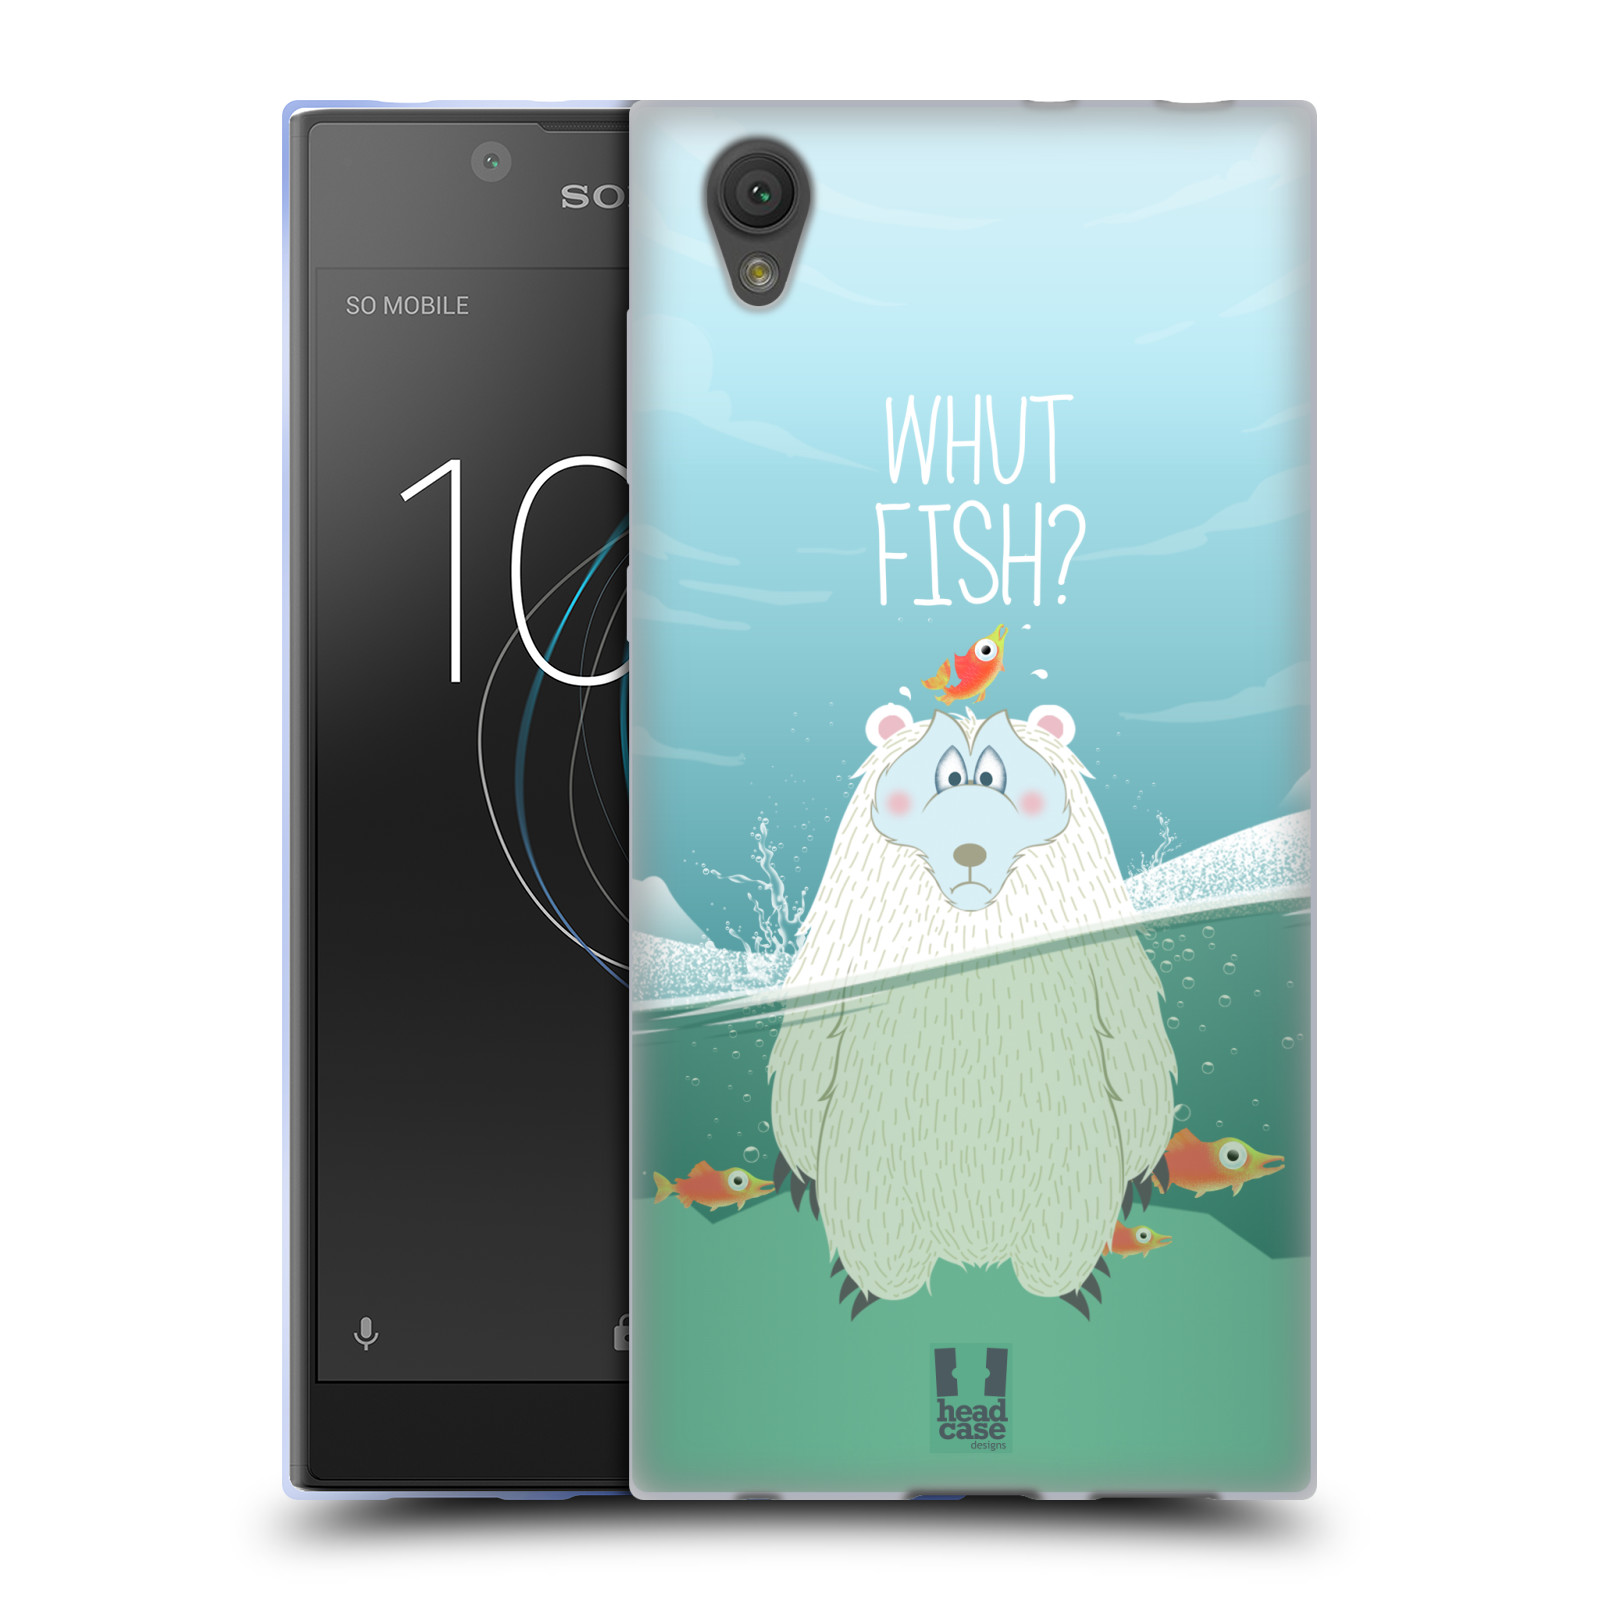 Silikonové pouzdro na mobil Sony Xperia L1 - Head Case - Medvěd Whut Fish?